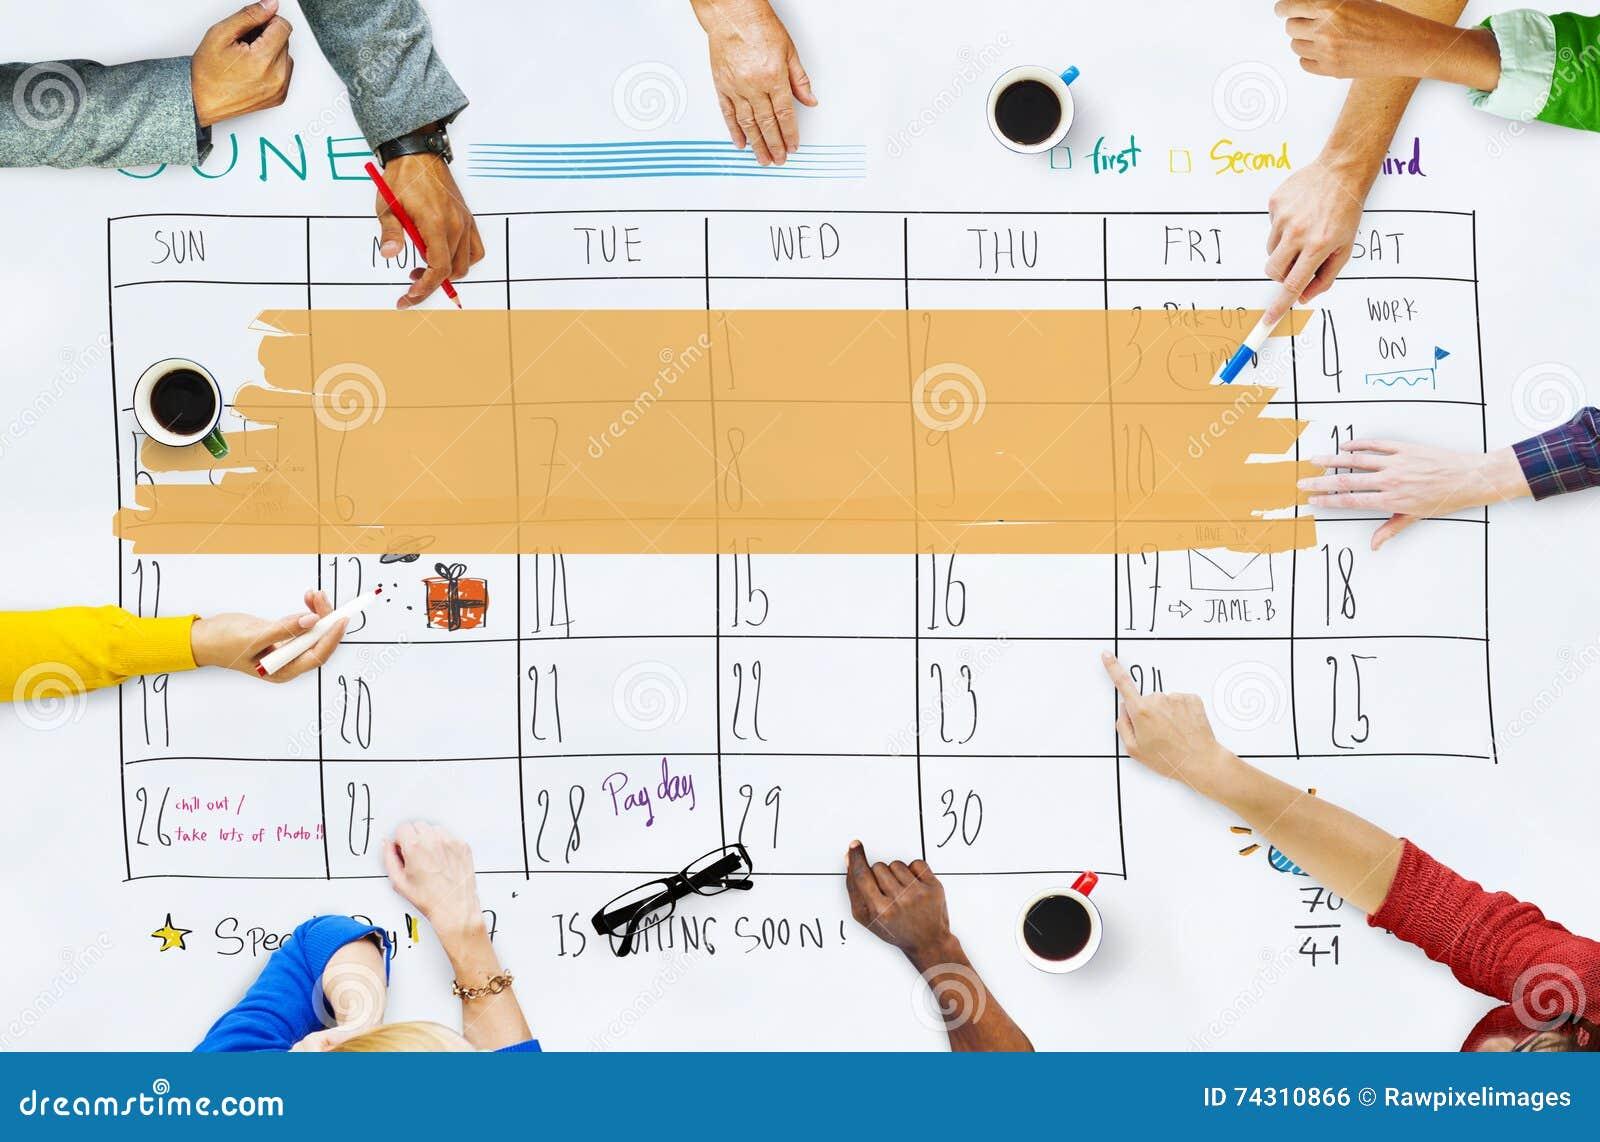 Coming Soon Calendario.Appointment Agenda Calendar Meeting Reminder Concept Stock